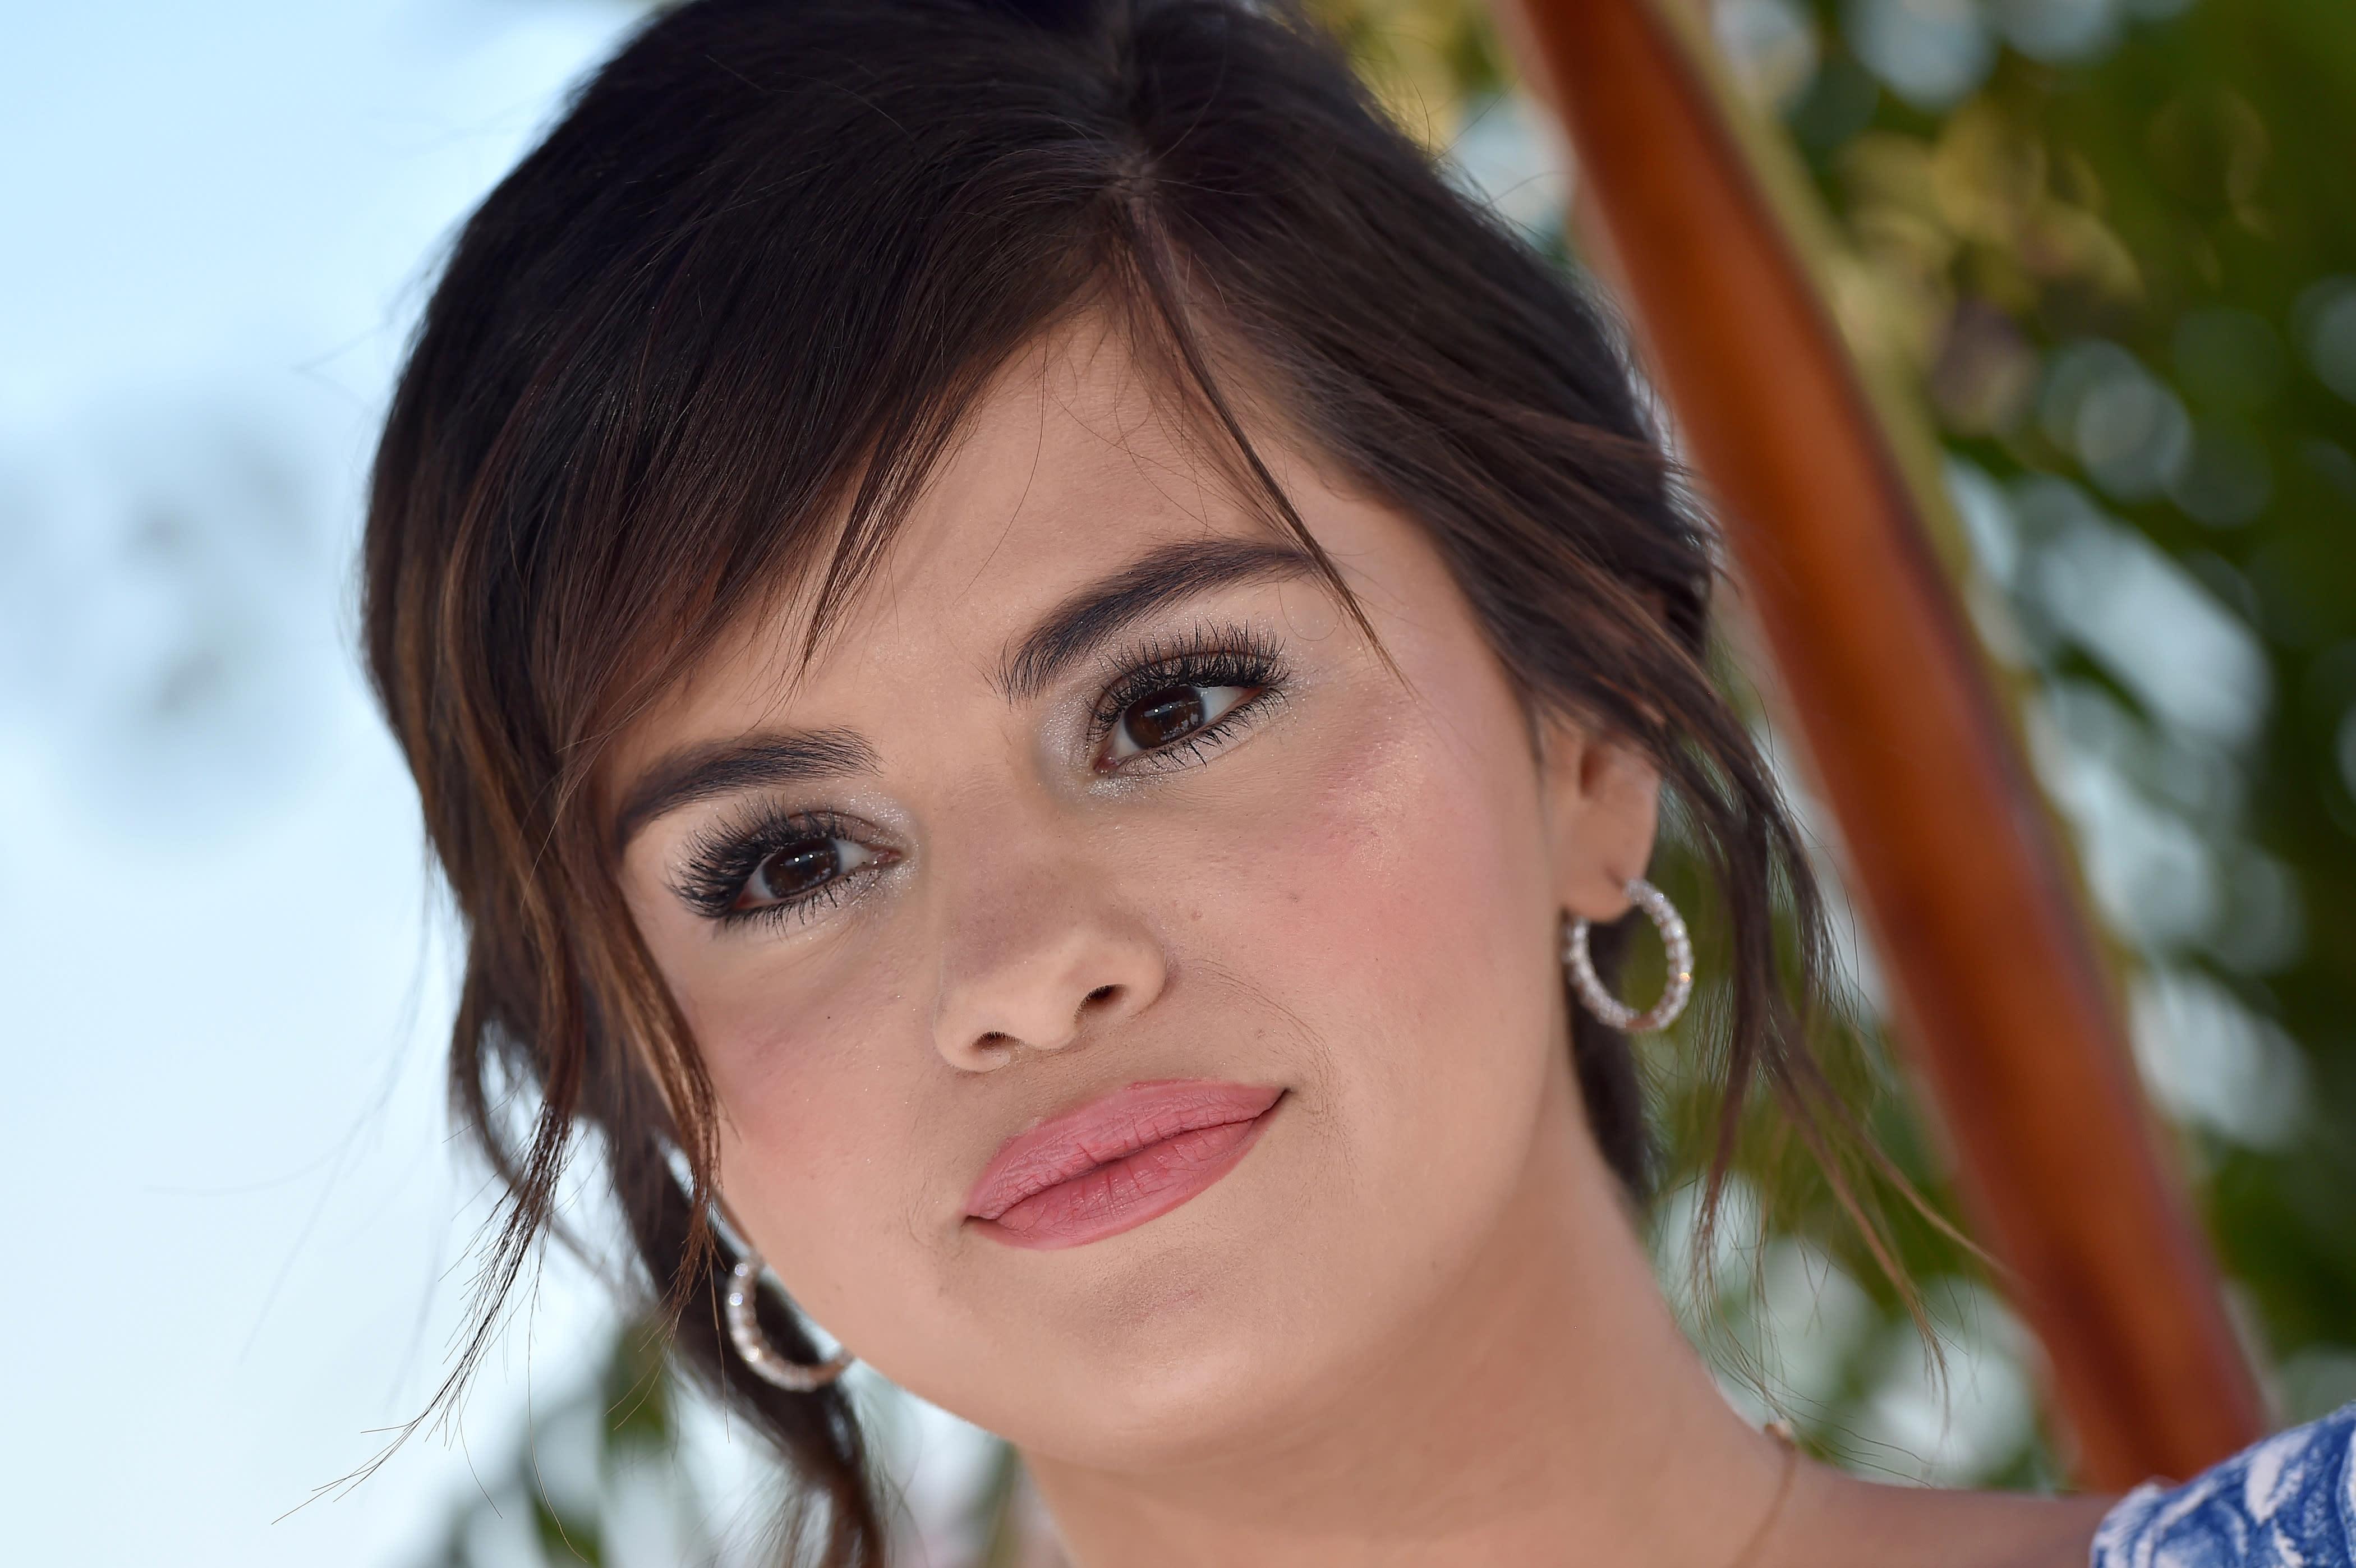 Selena Gomez reportedly checks into treatment center